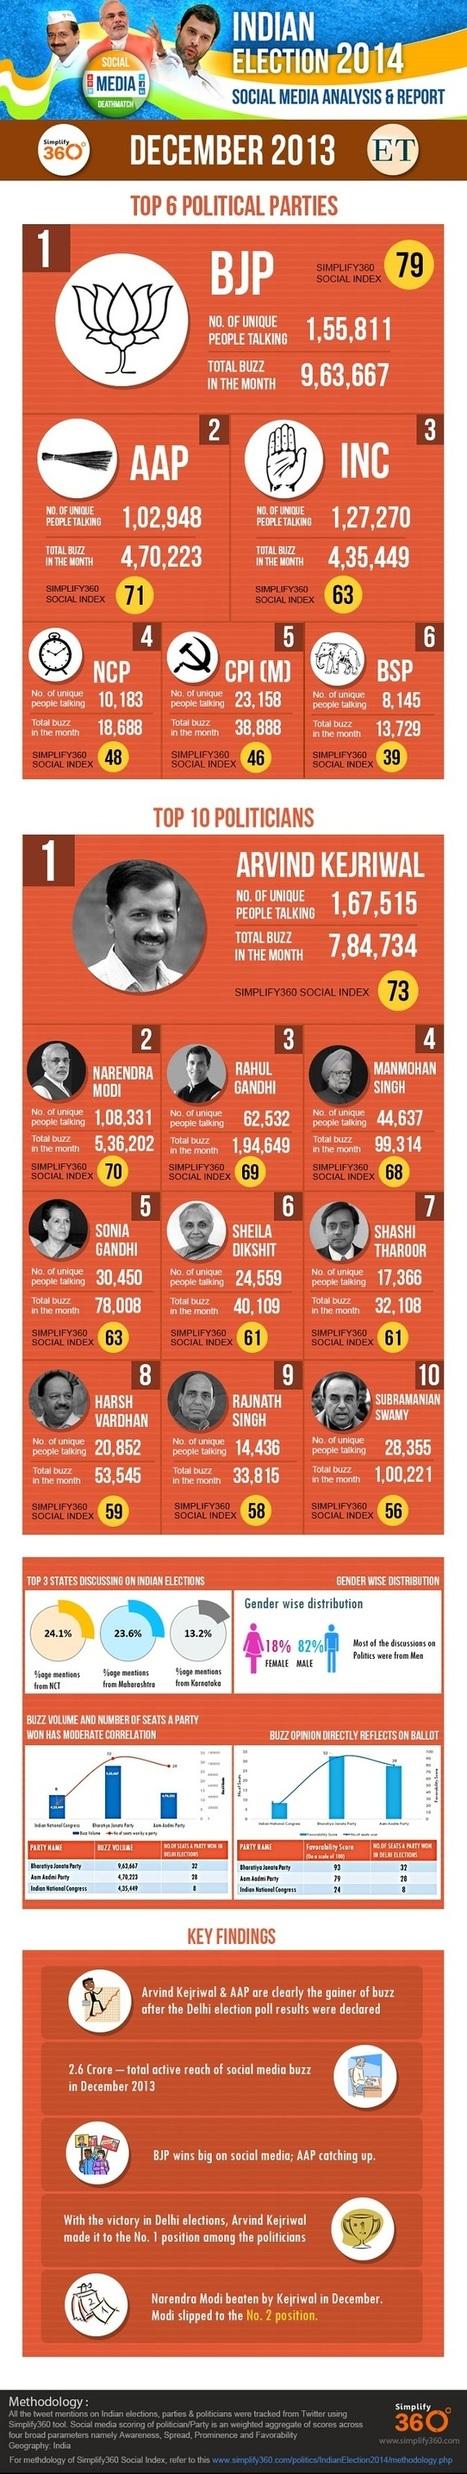 Arvind Kejriwal tops Narendra Modi in Social Media in December 2013 | Trriger Flash | Scoop.it